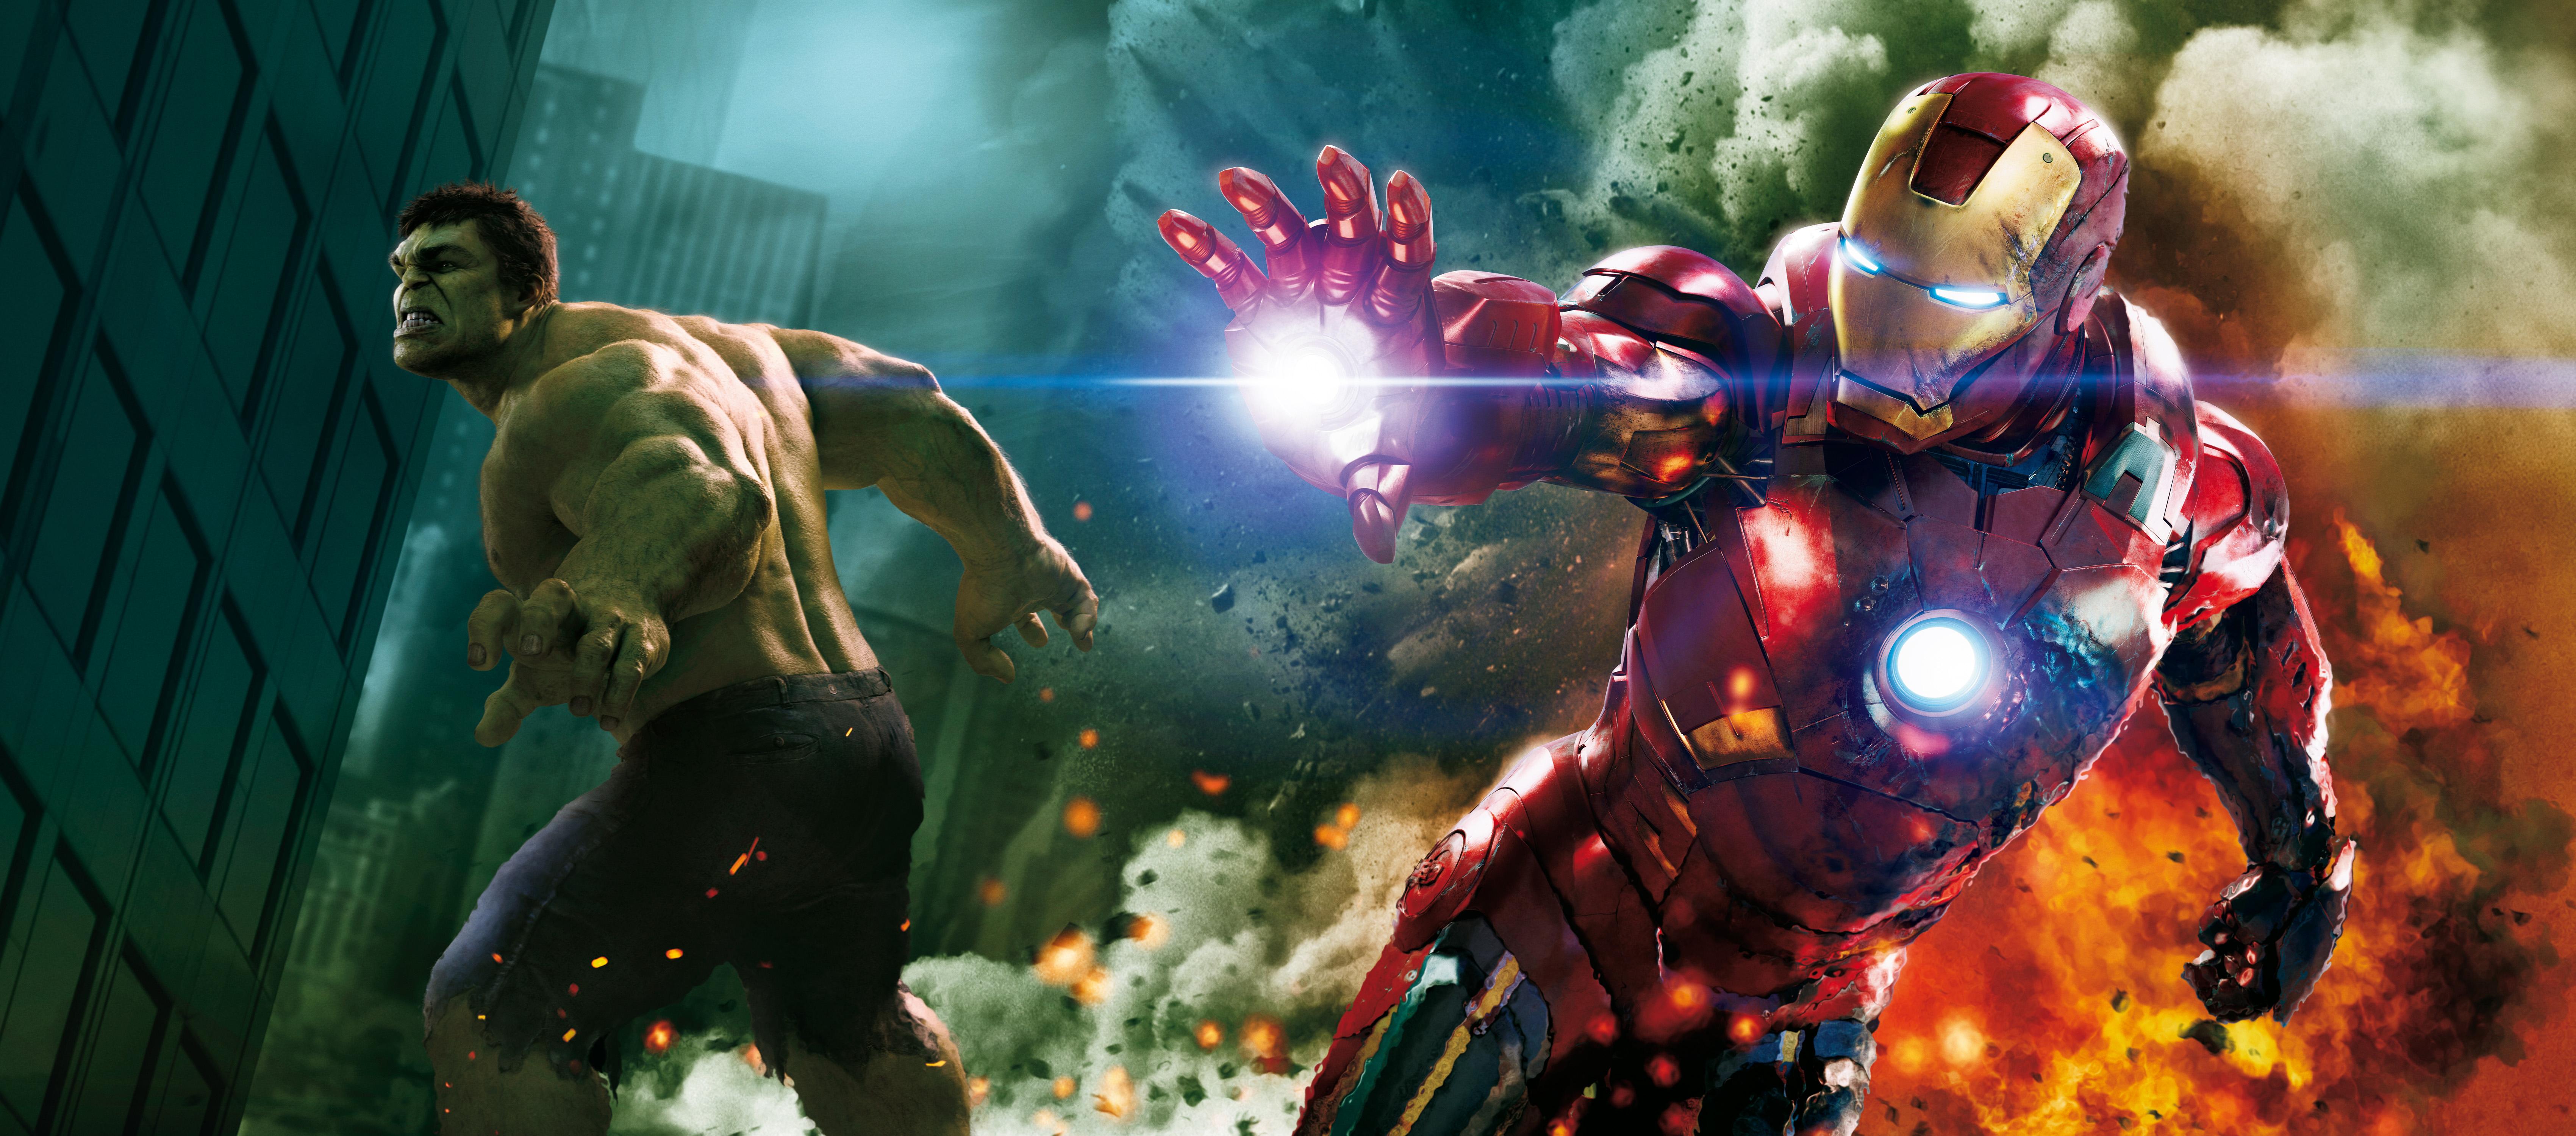 Update On    Iron Man 4    And New Hulk MovieIron Hulk